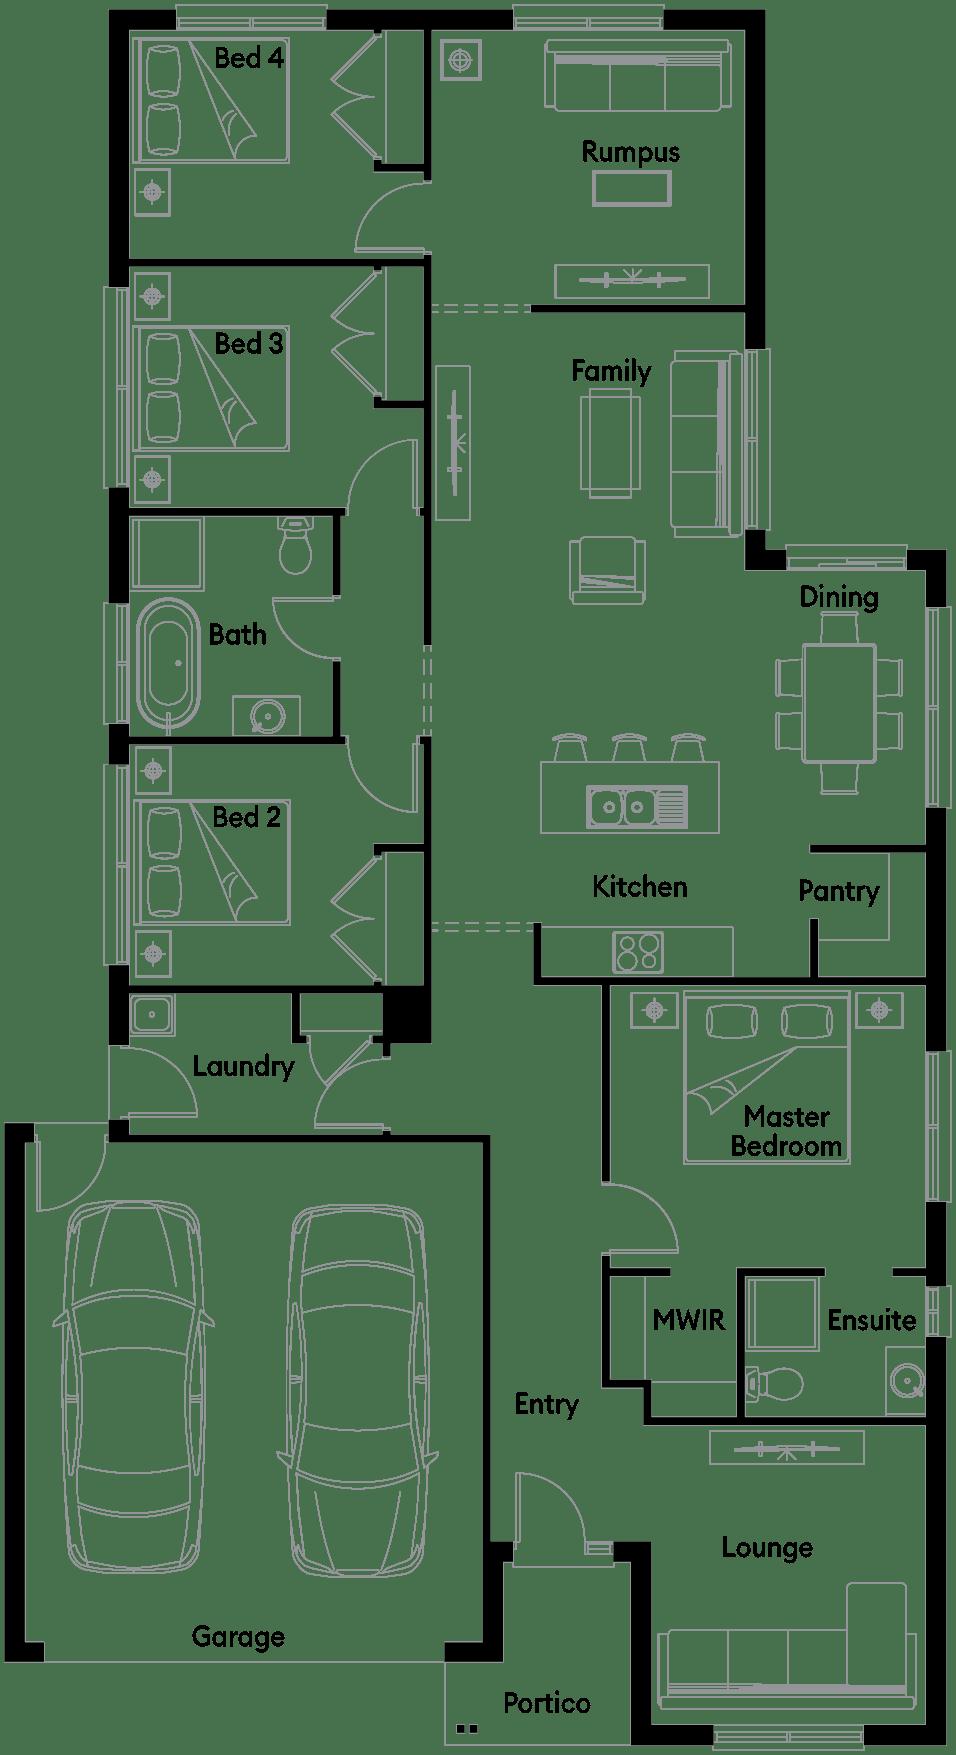 FloorPlan1_HOUSE727_Kew_21